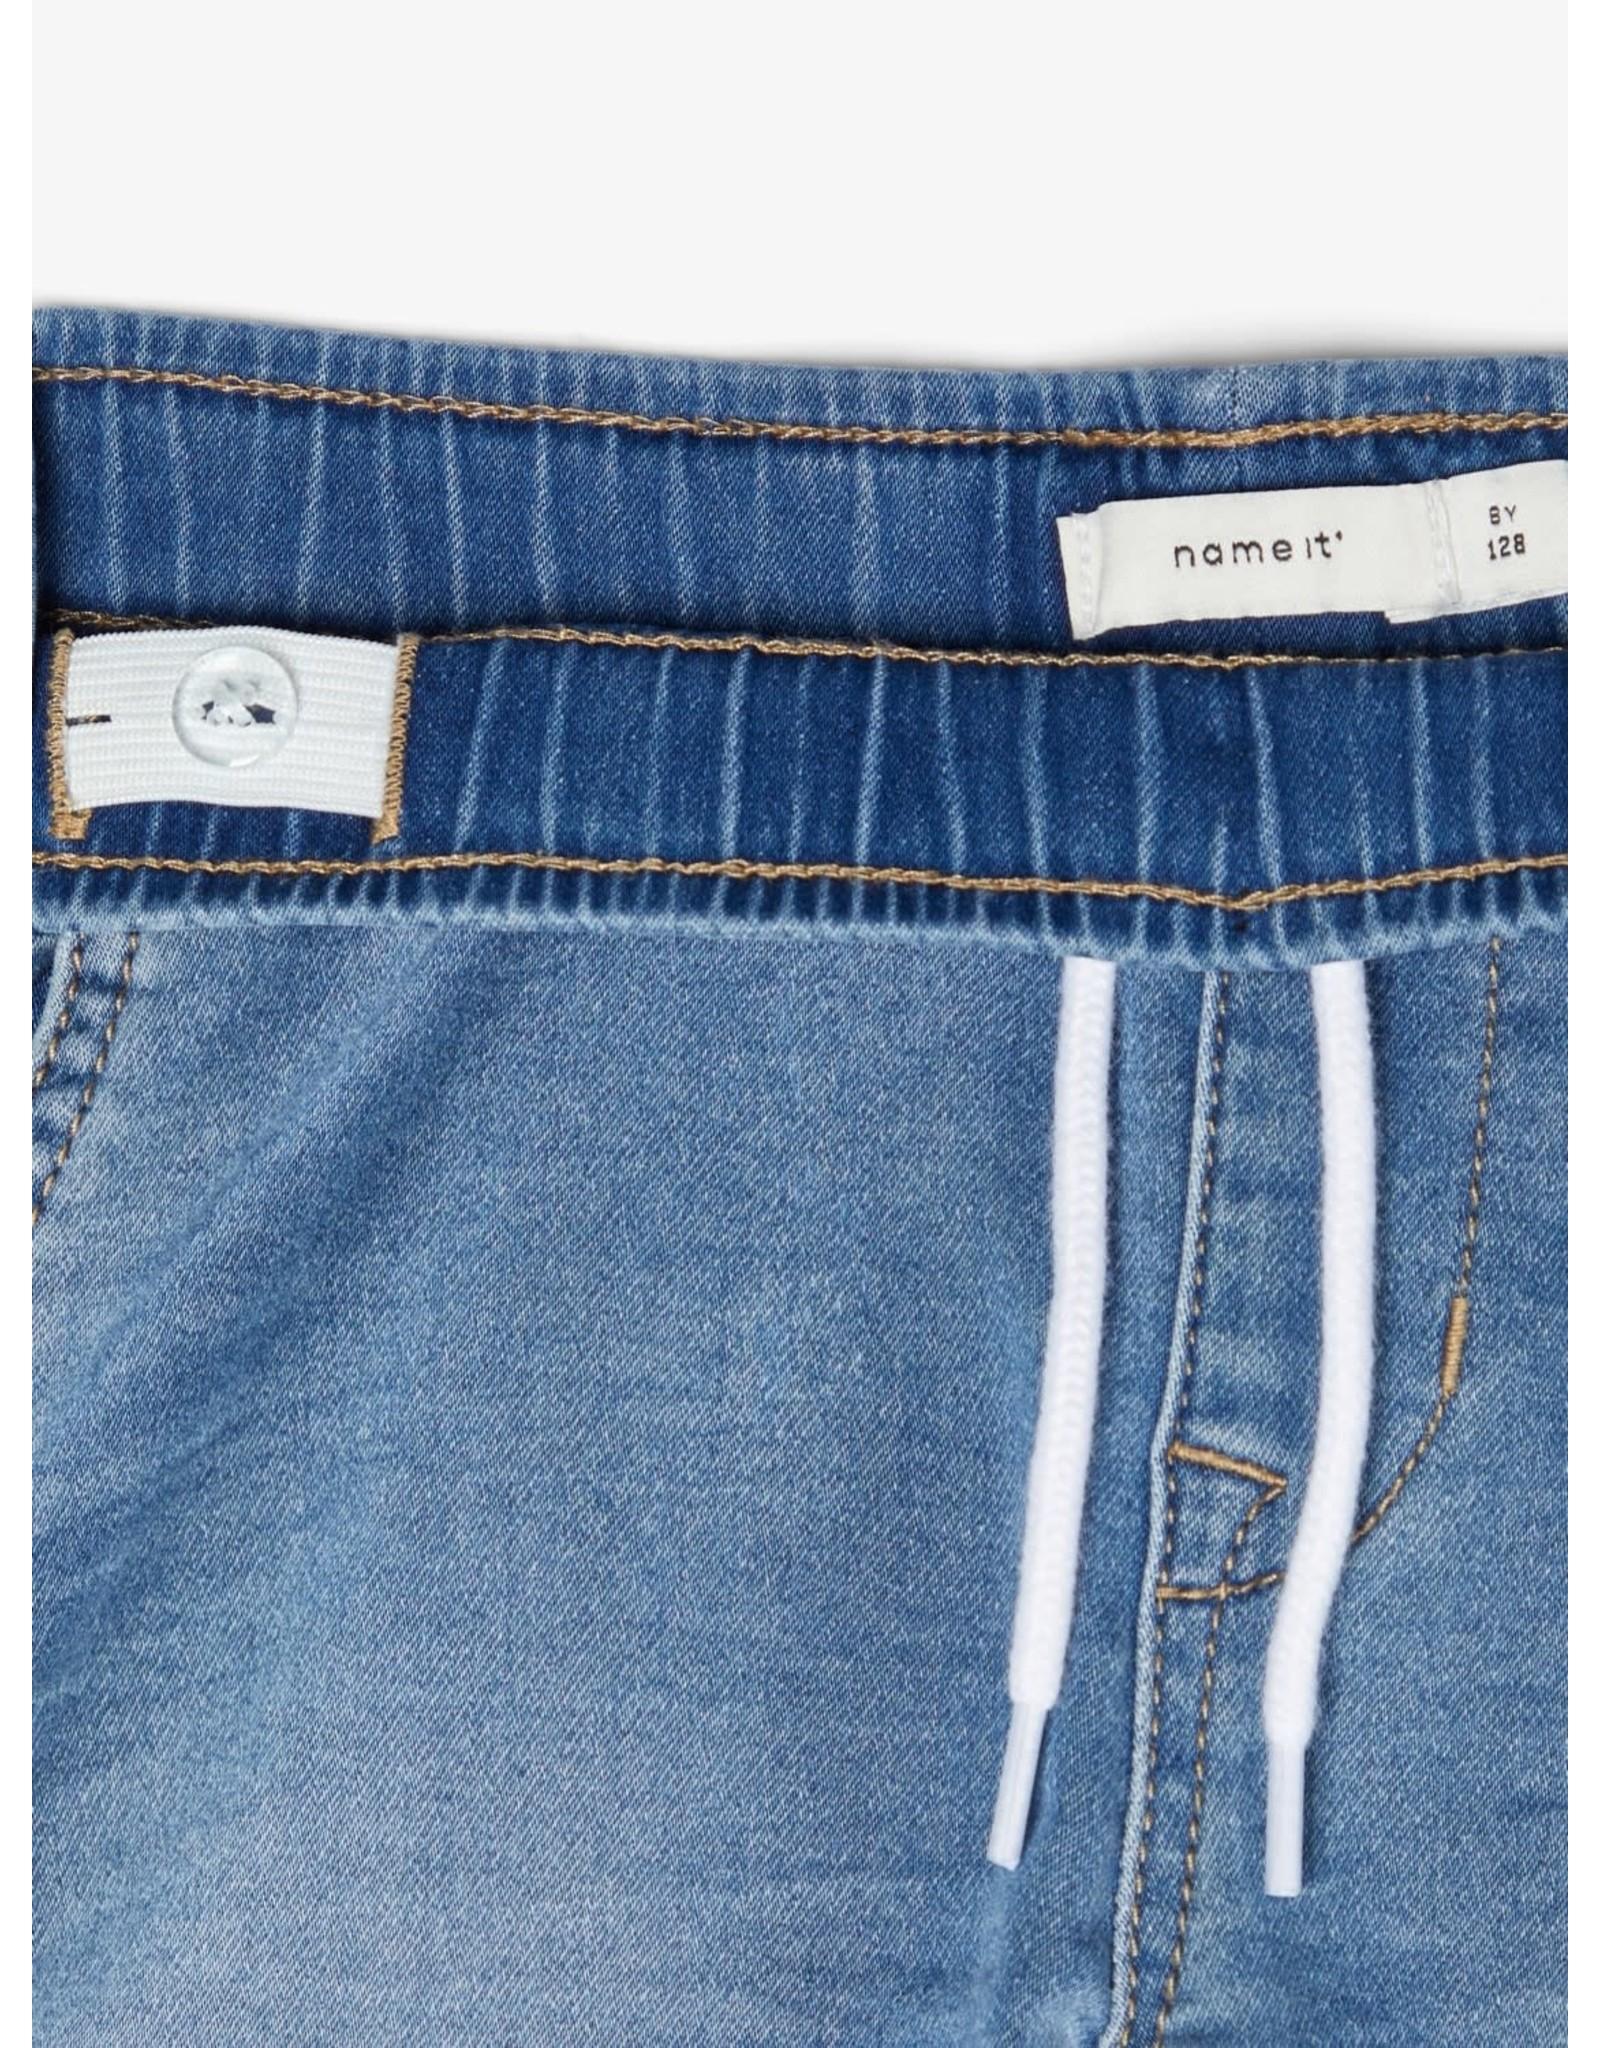 Name It Losse zachte jeansshort Medium Blue van Name It